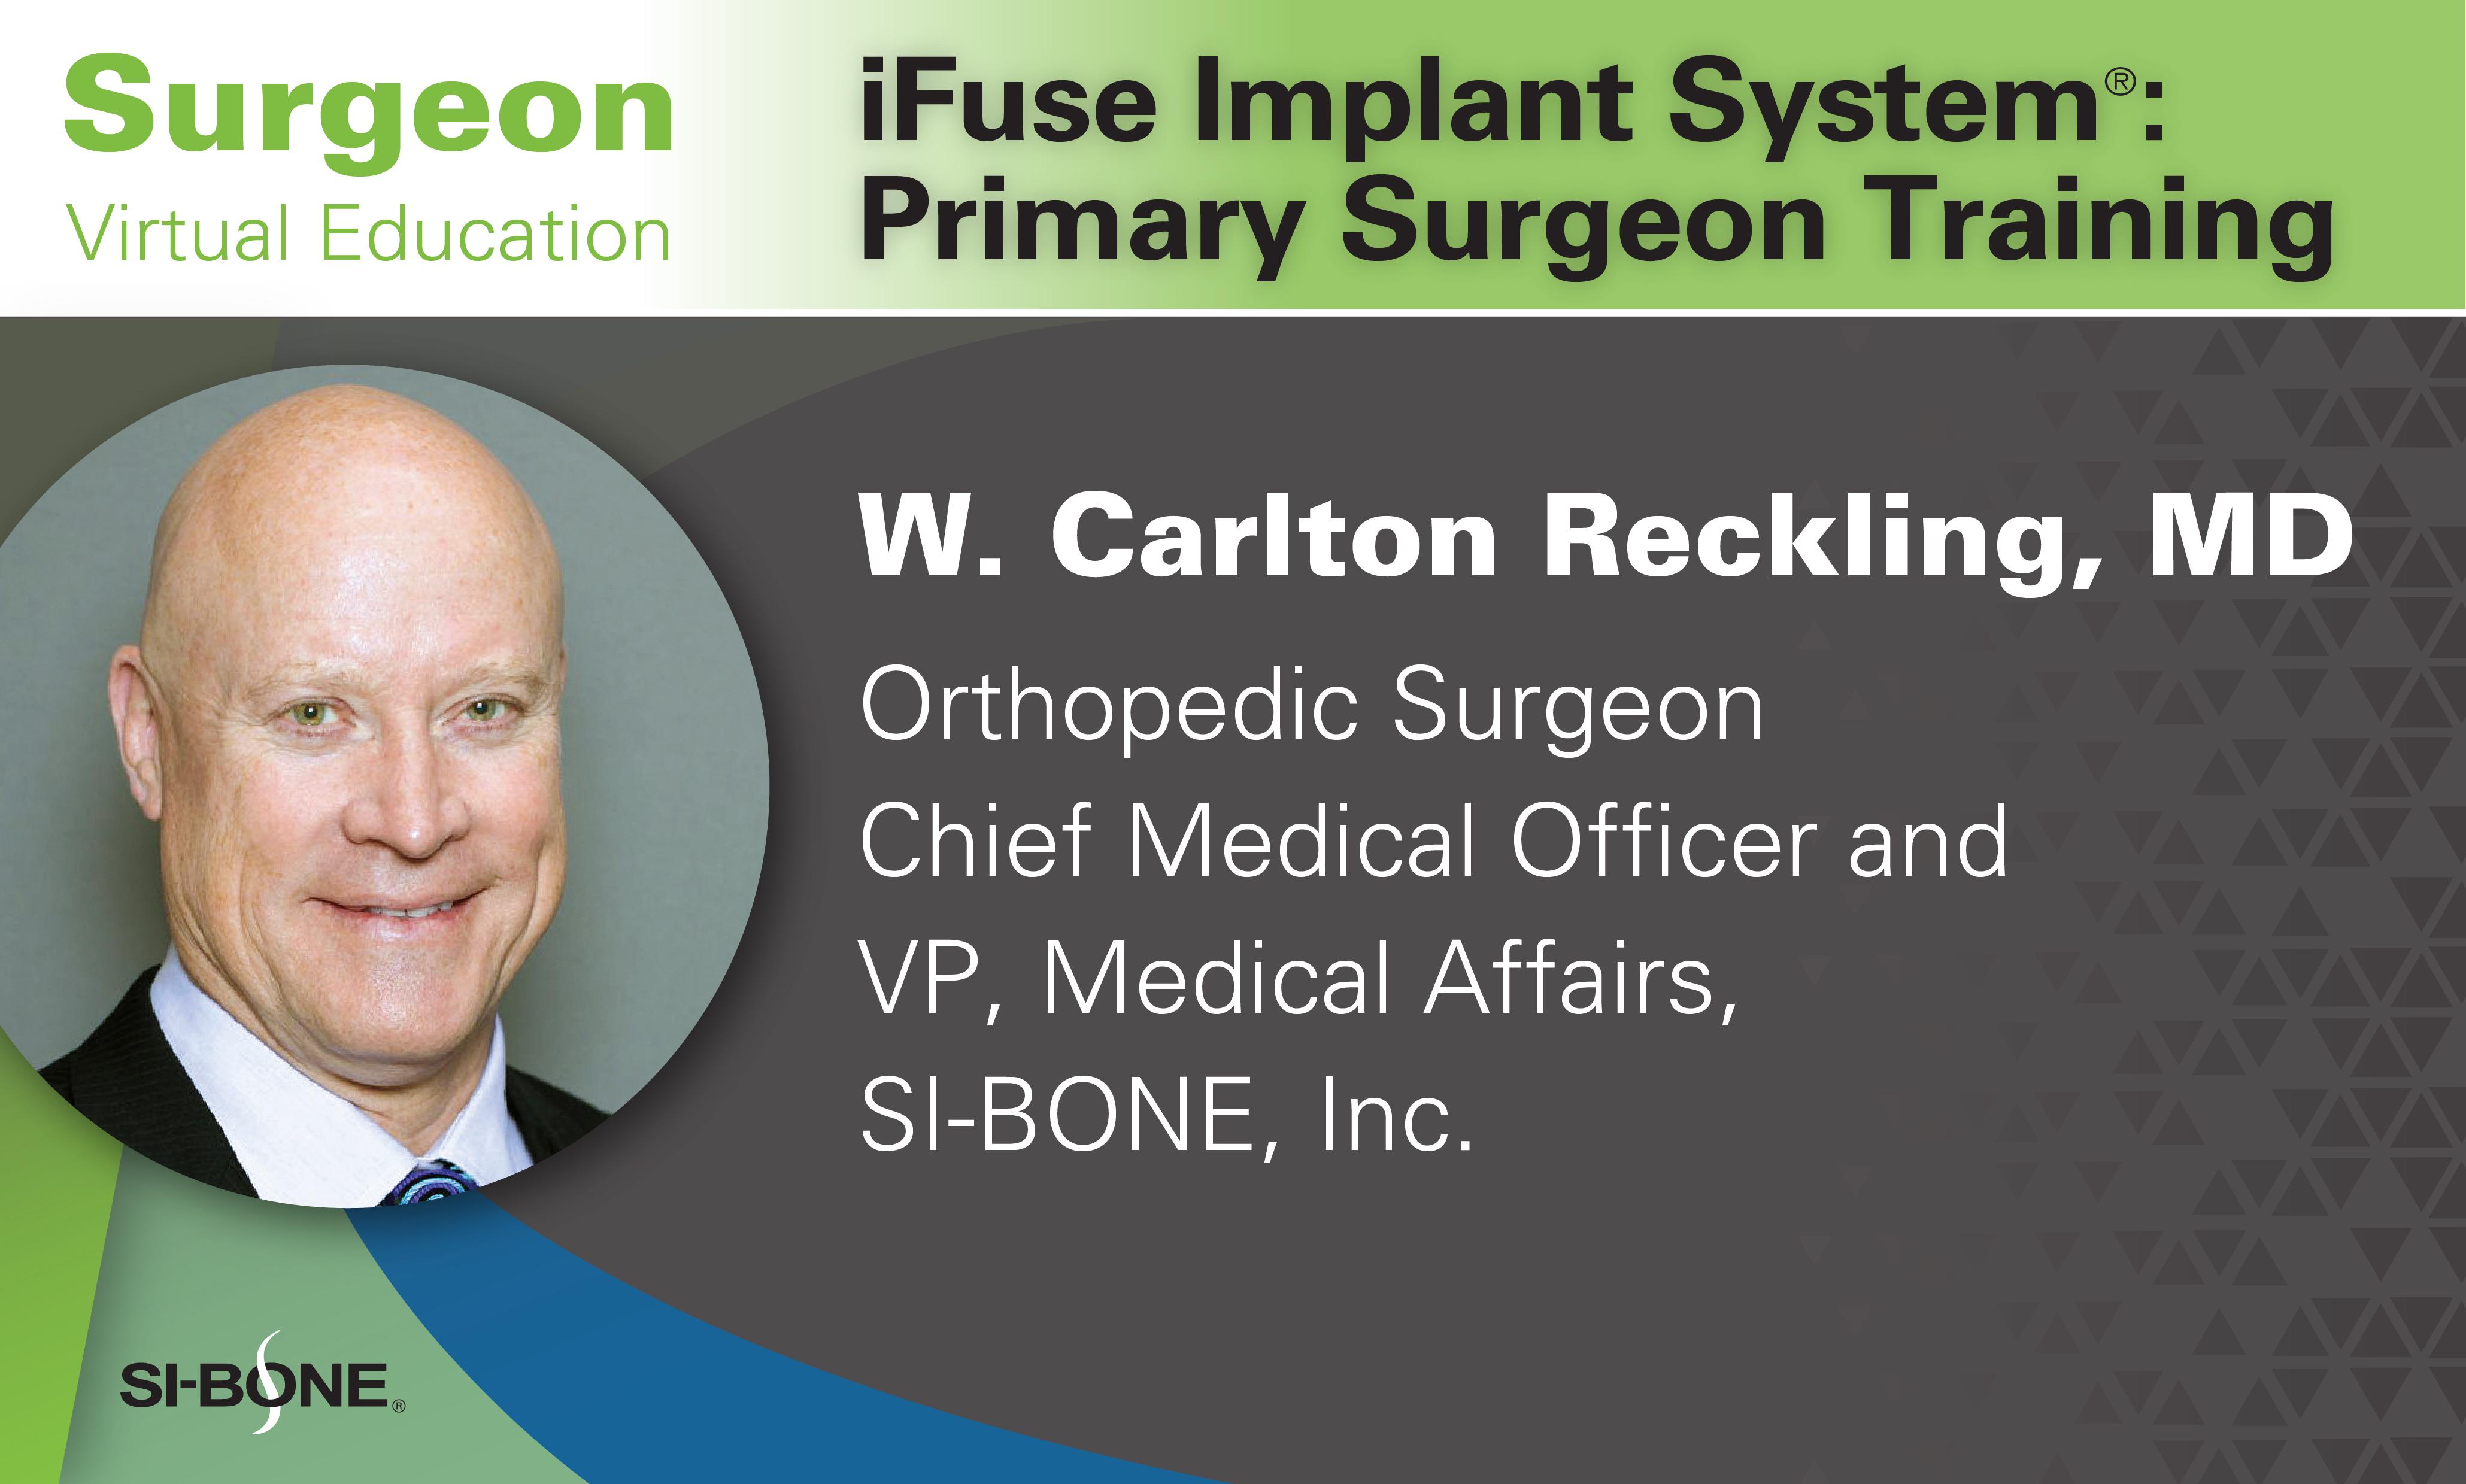 May 27 Primary Surgeon Training Virtual Educational Webinar